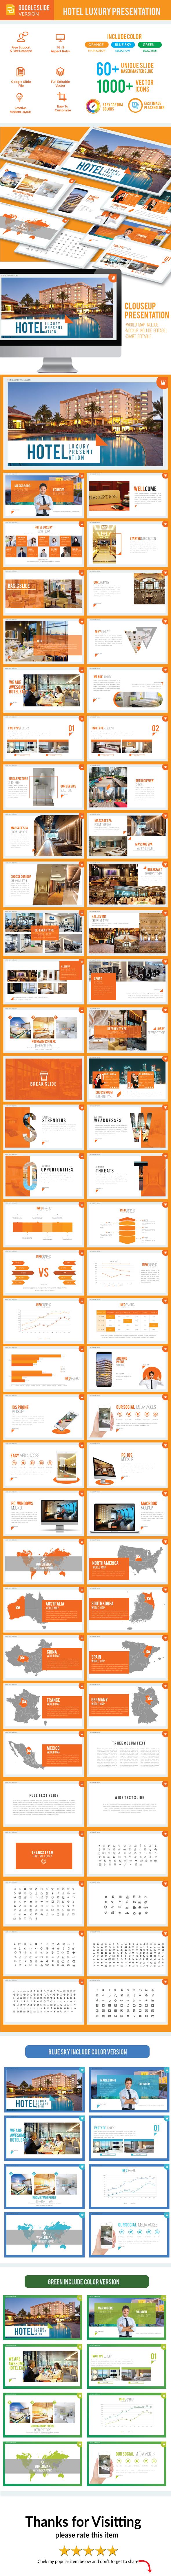 Hotel Luxury - Google Slide Presentation Template - Google Slides Presentation Templates